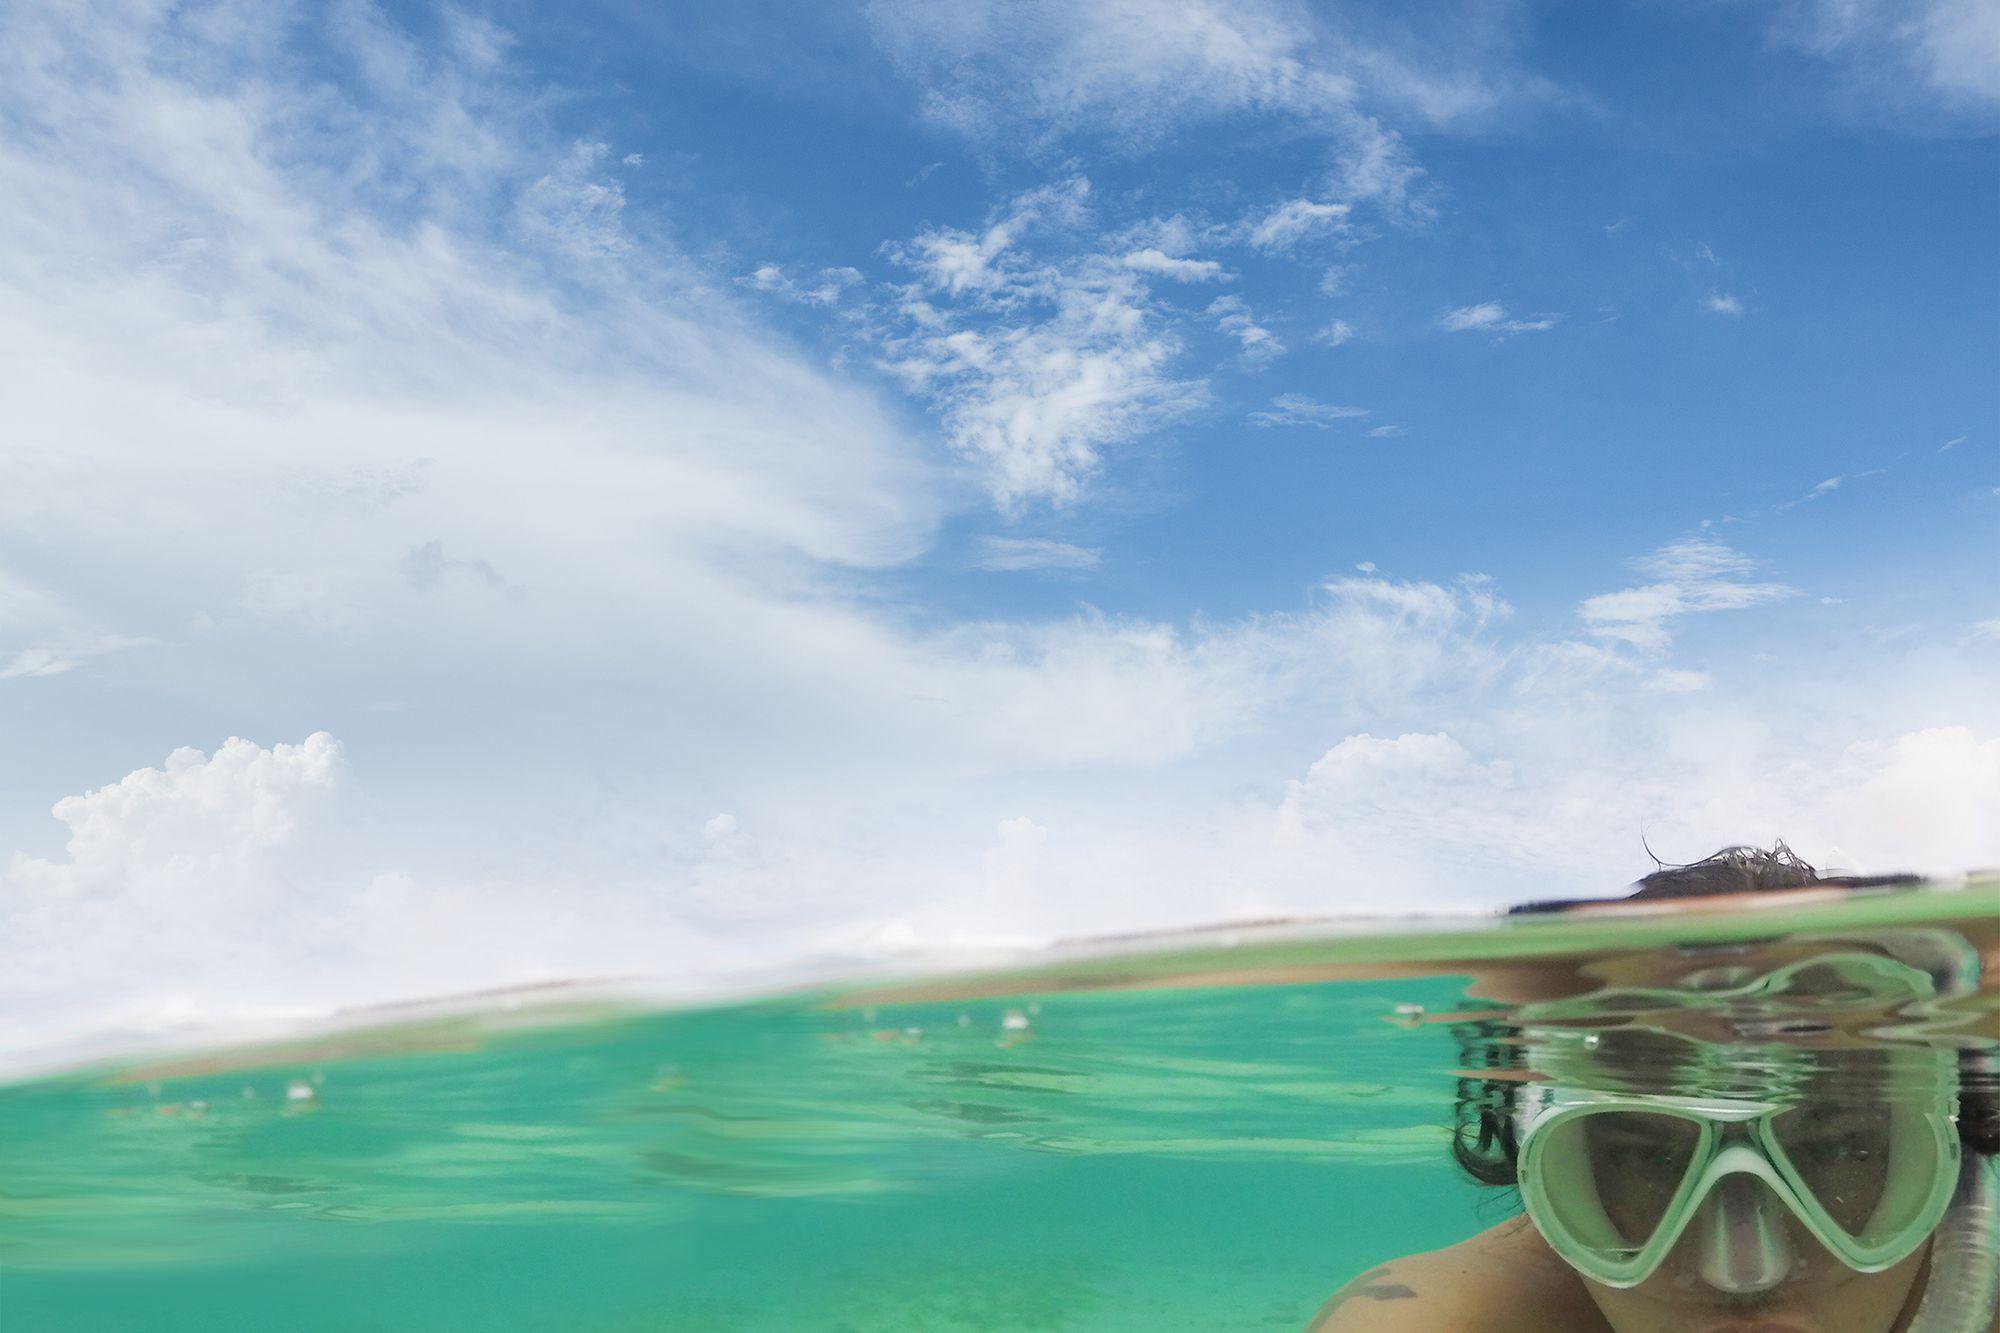 Angelo Villagomez '04 snorkeling.